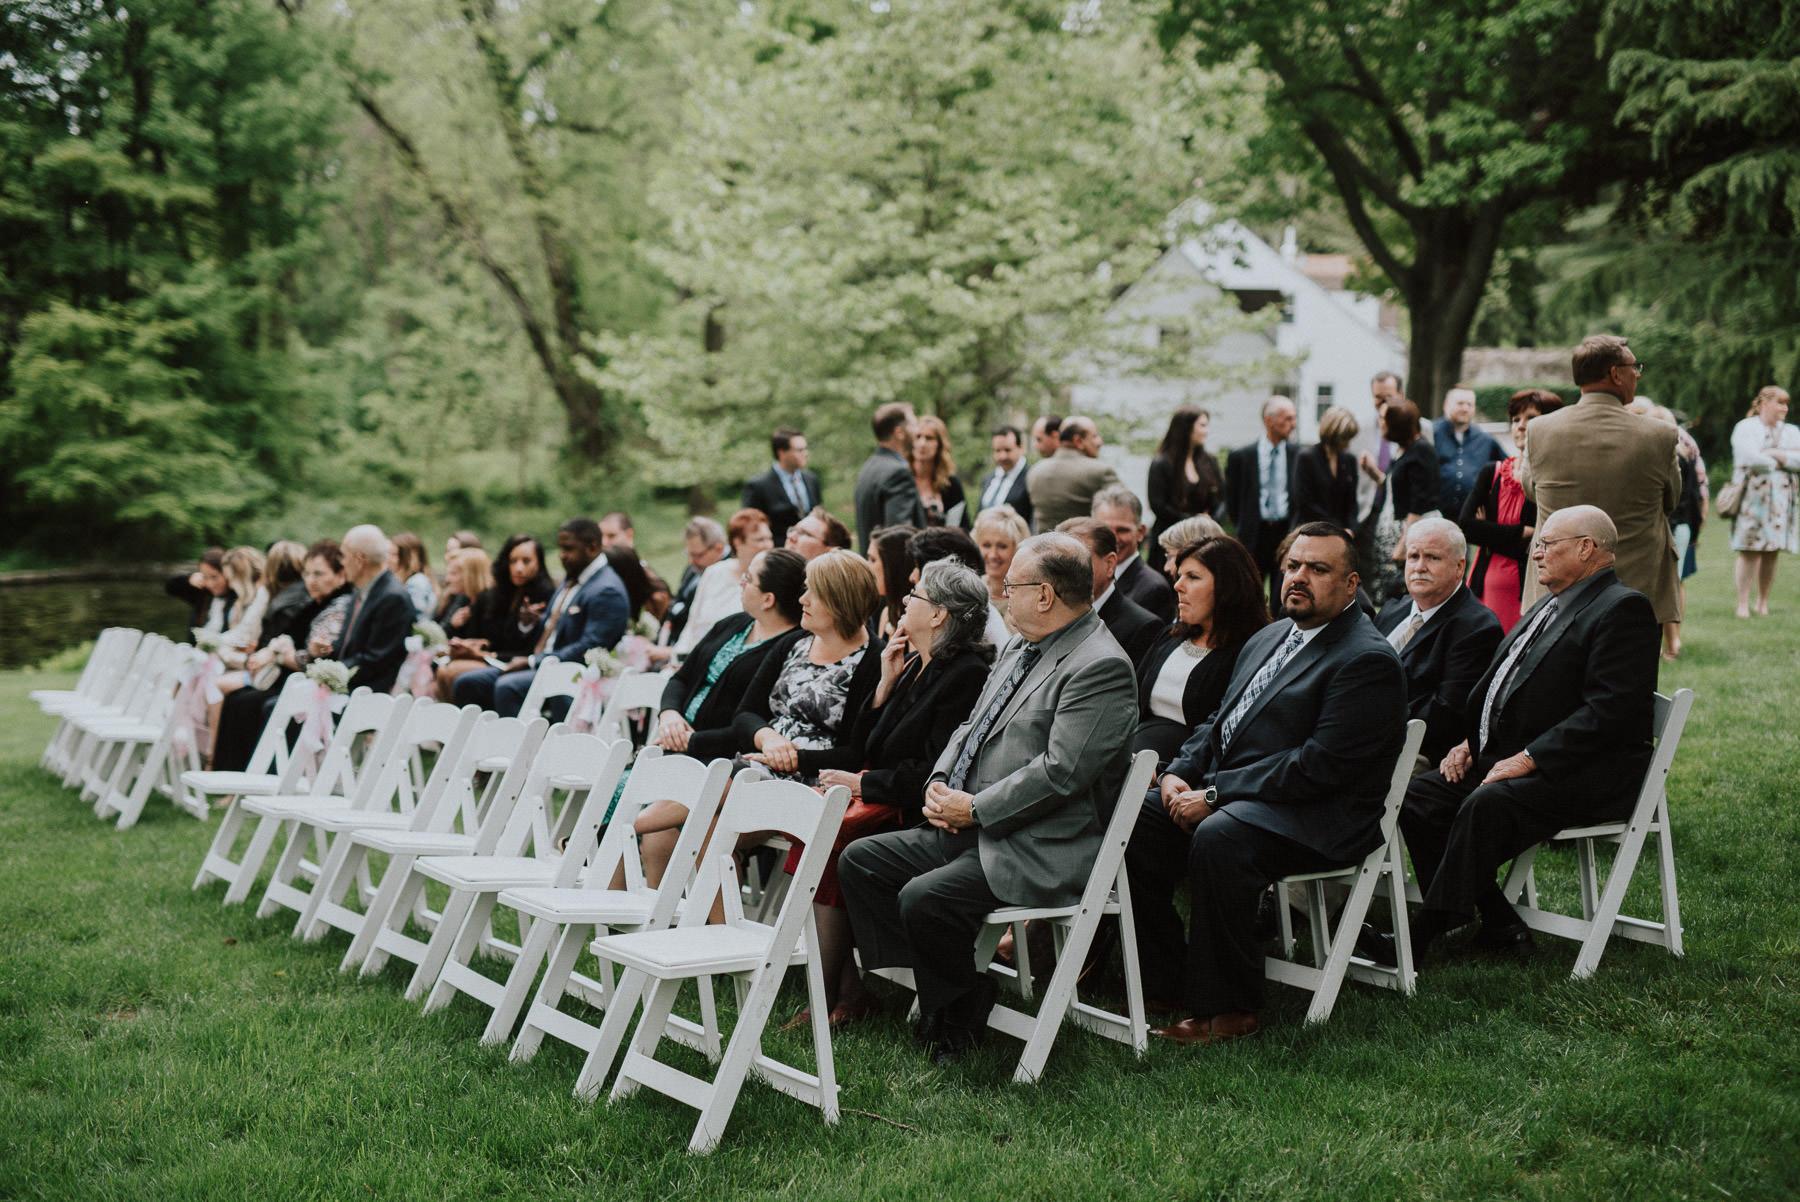 appleford-estate-wedding-photography-52.jpg